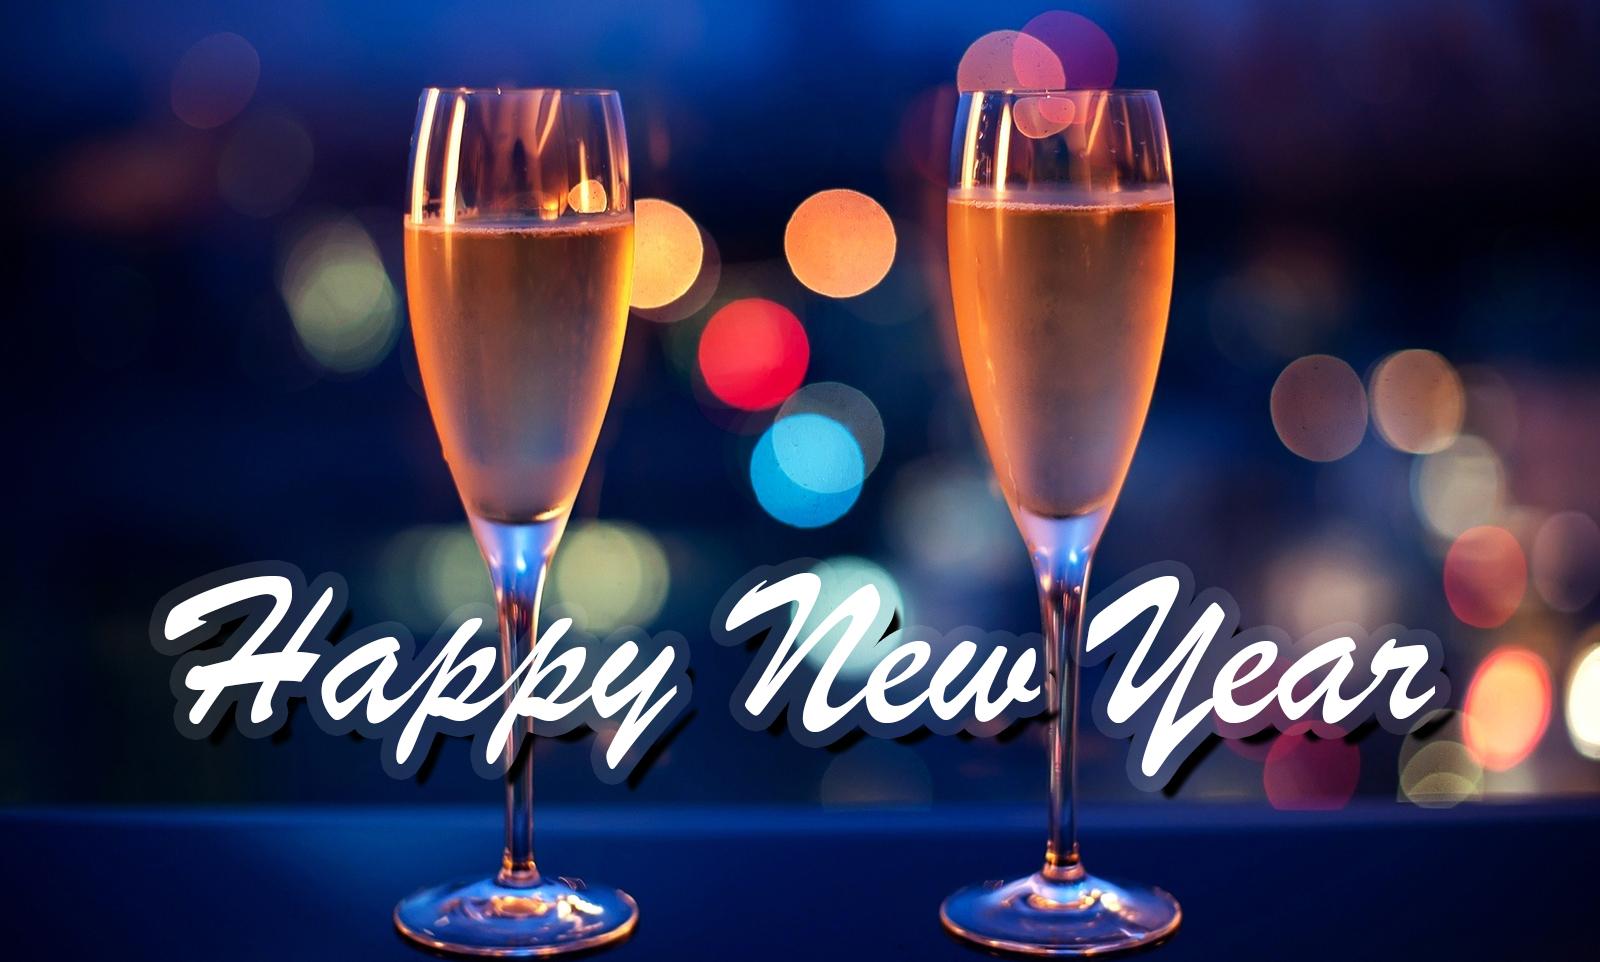 Hd wallpaper new 2017 - New Years Eve 2017 Wallpaper Hd Wines